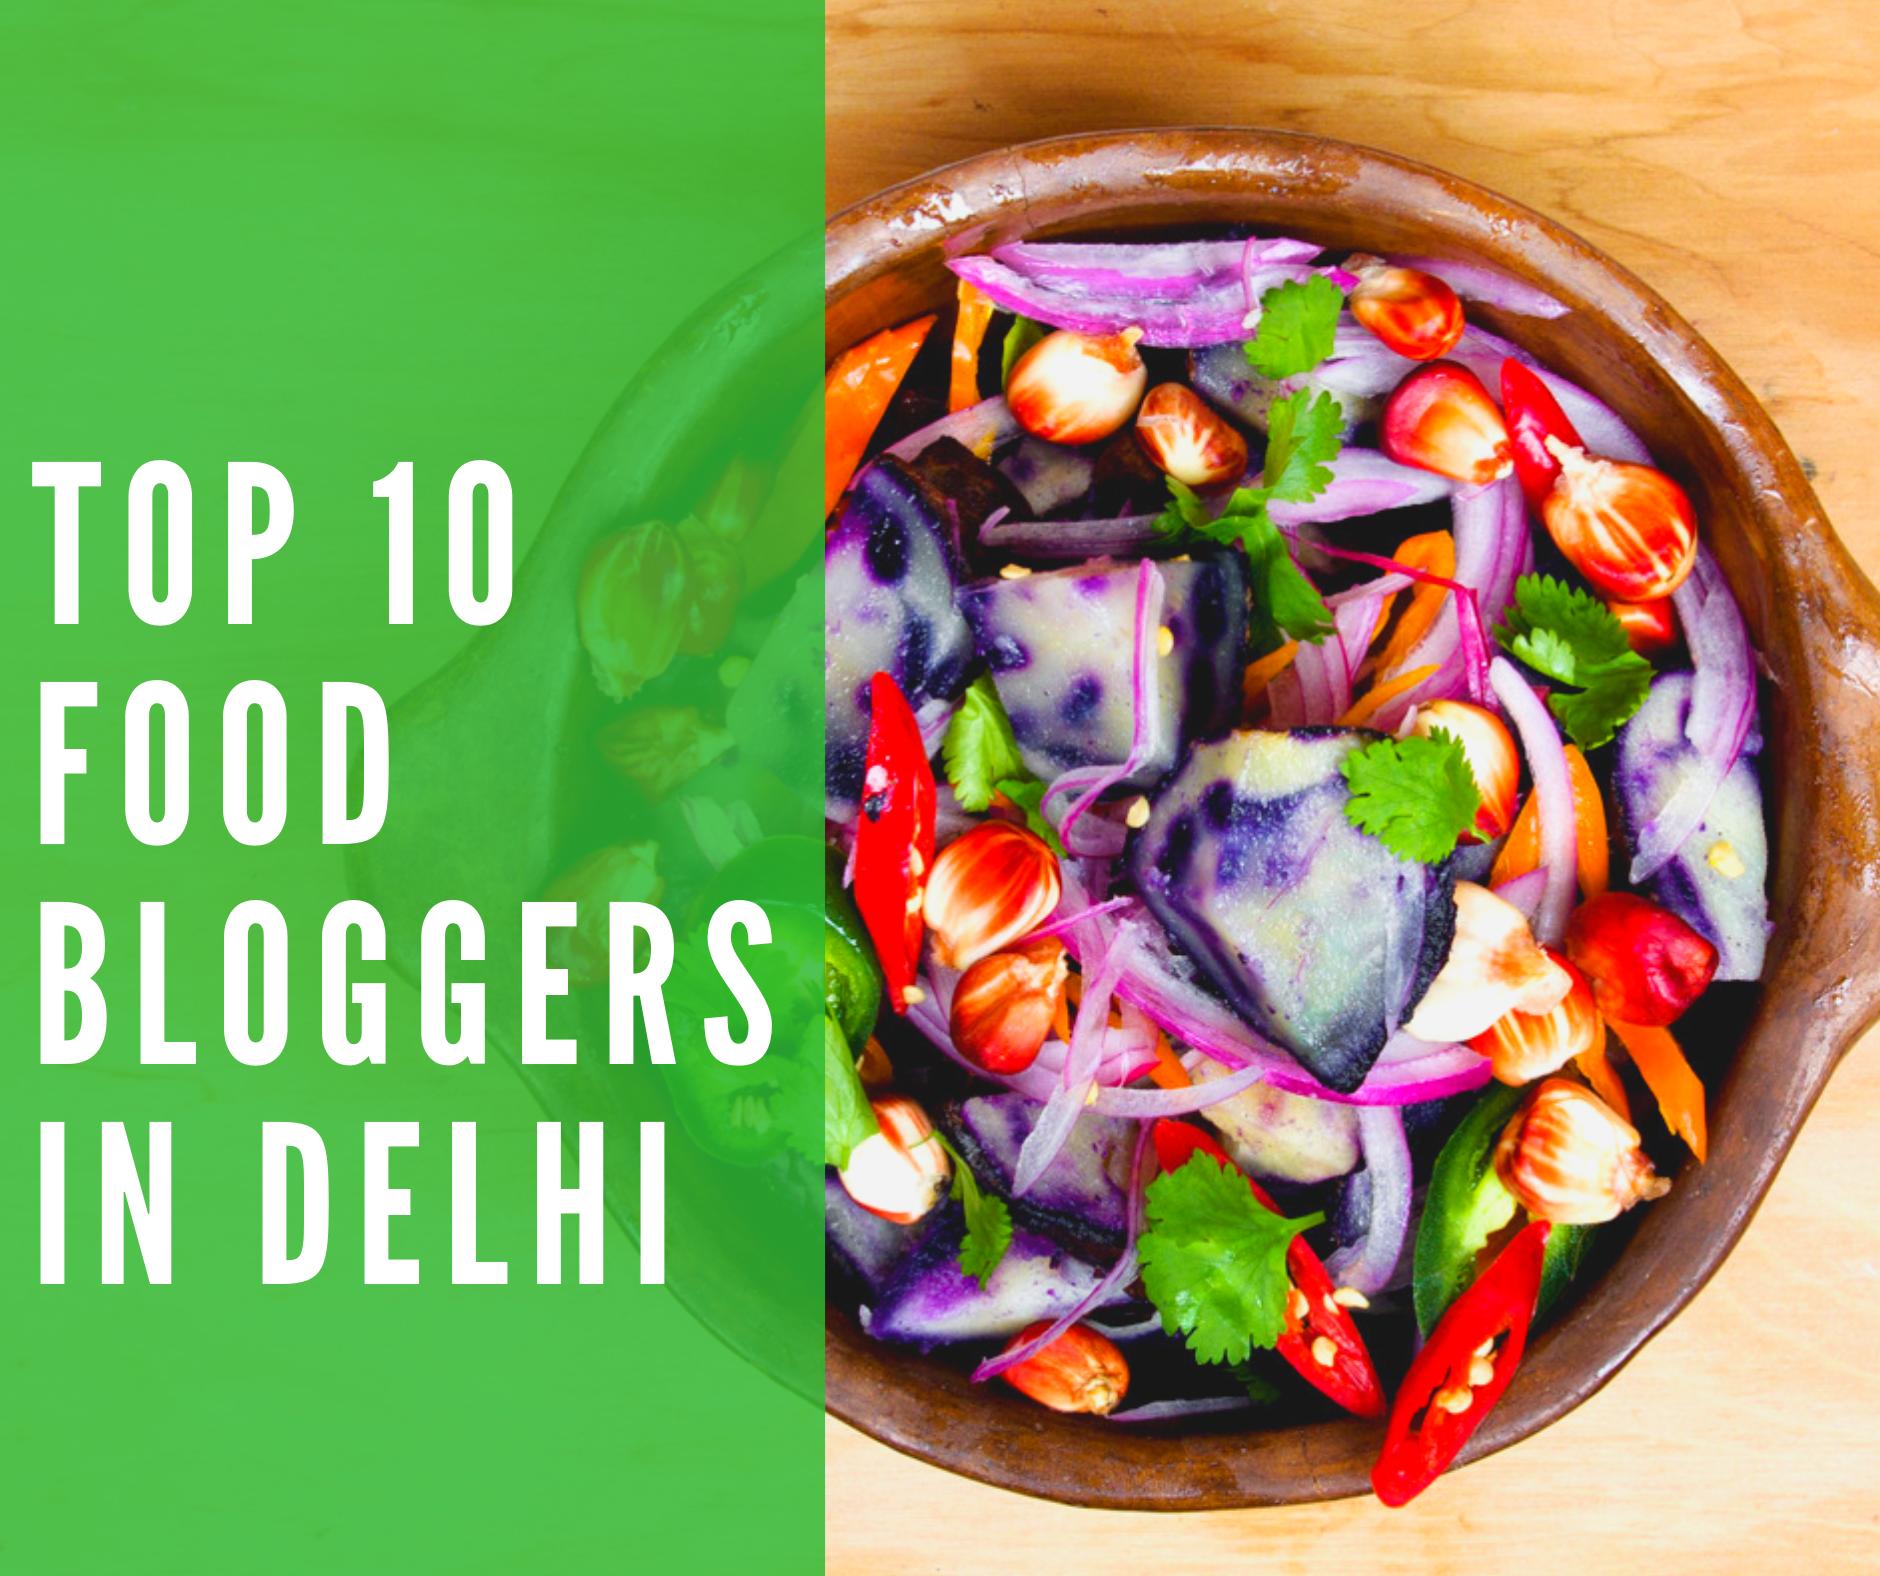 Top 10 food bloggers in Delhi